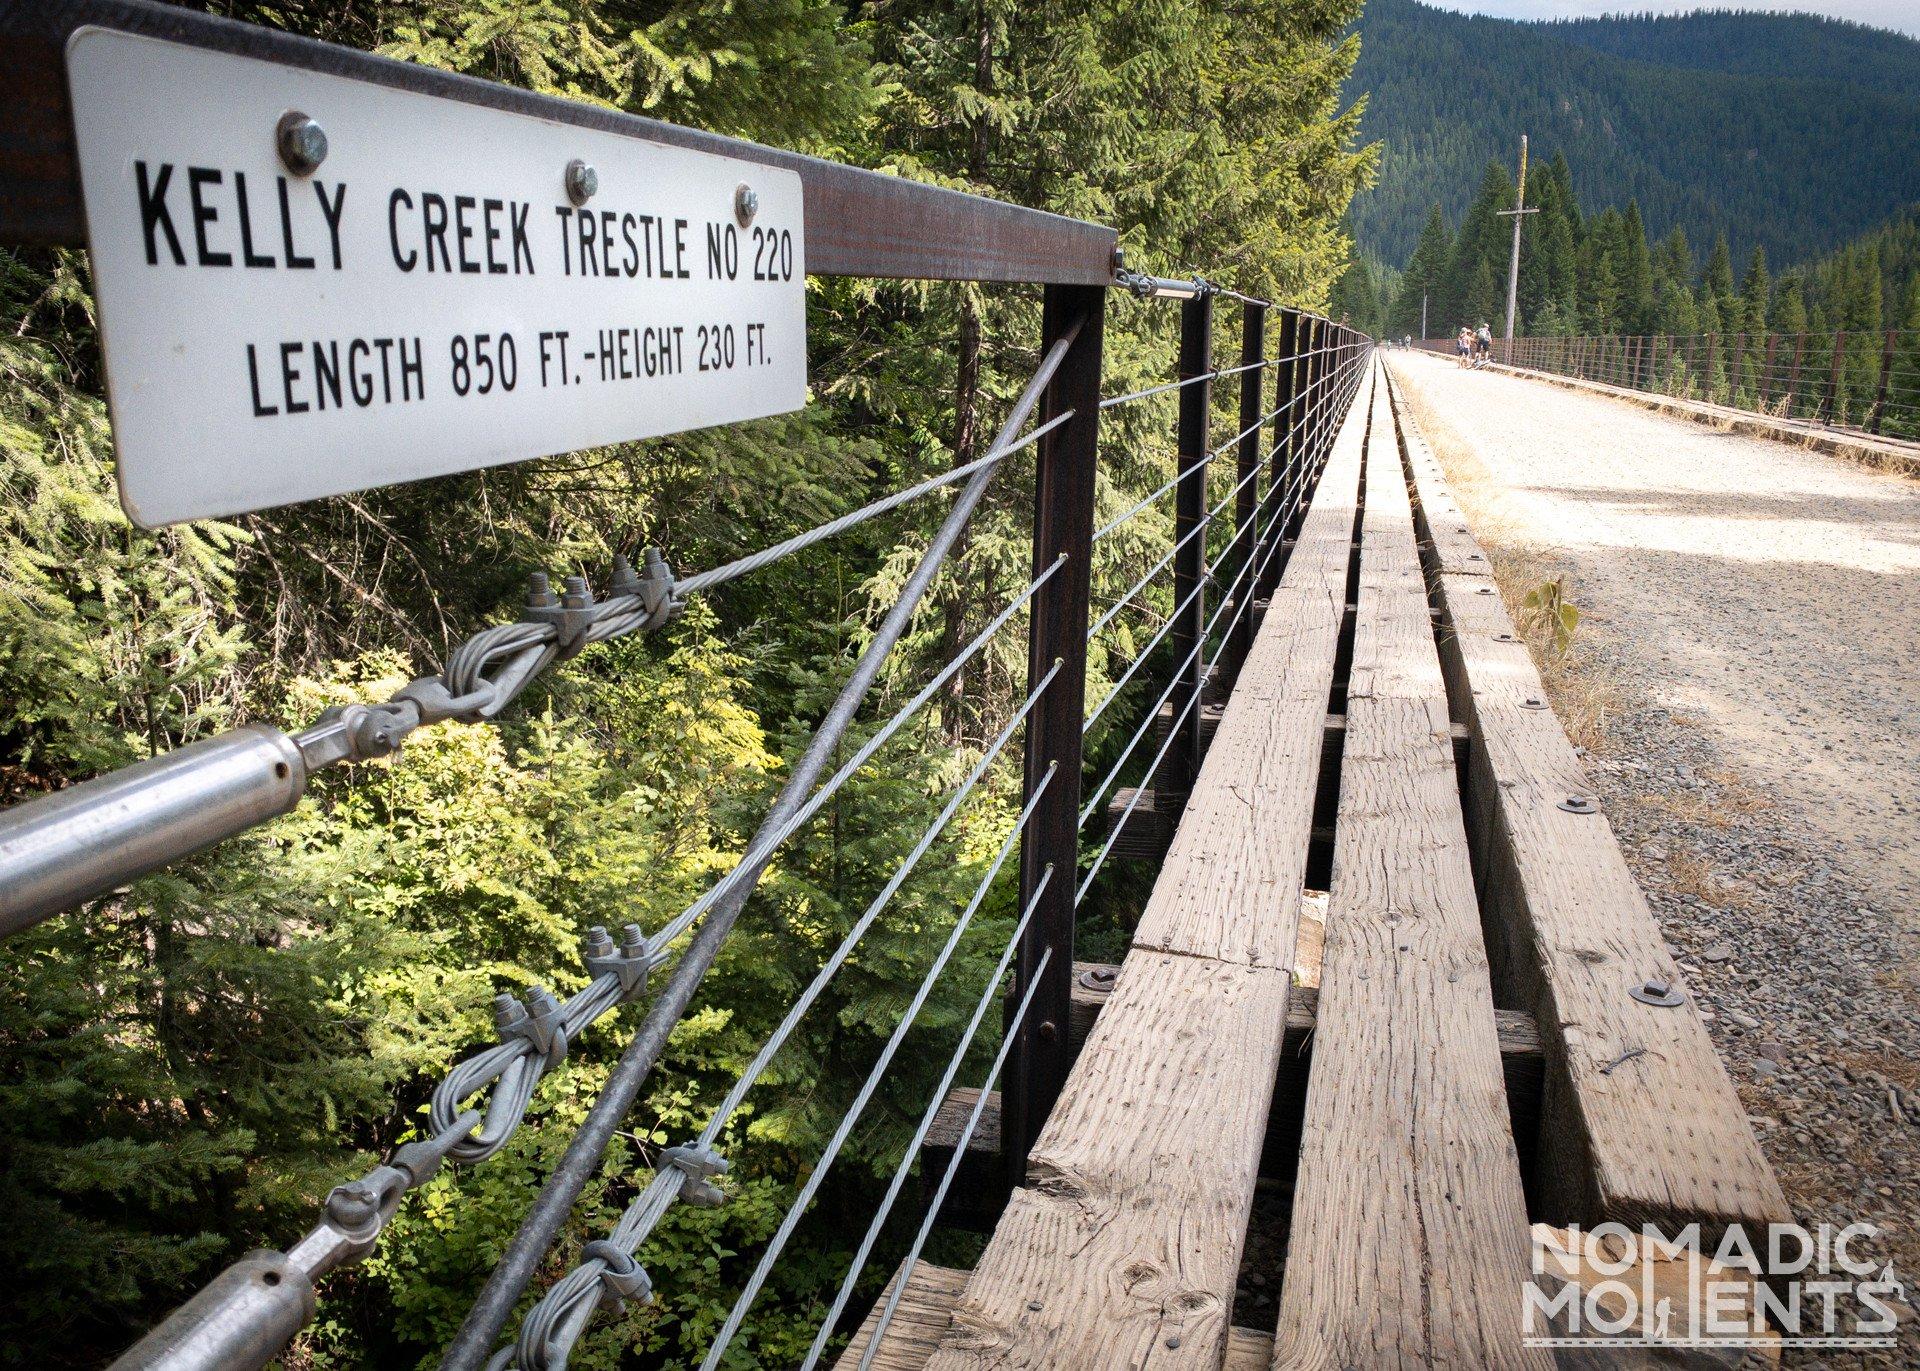 Kelly Creek Trestle